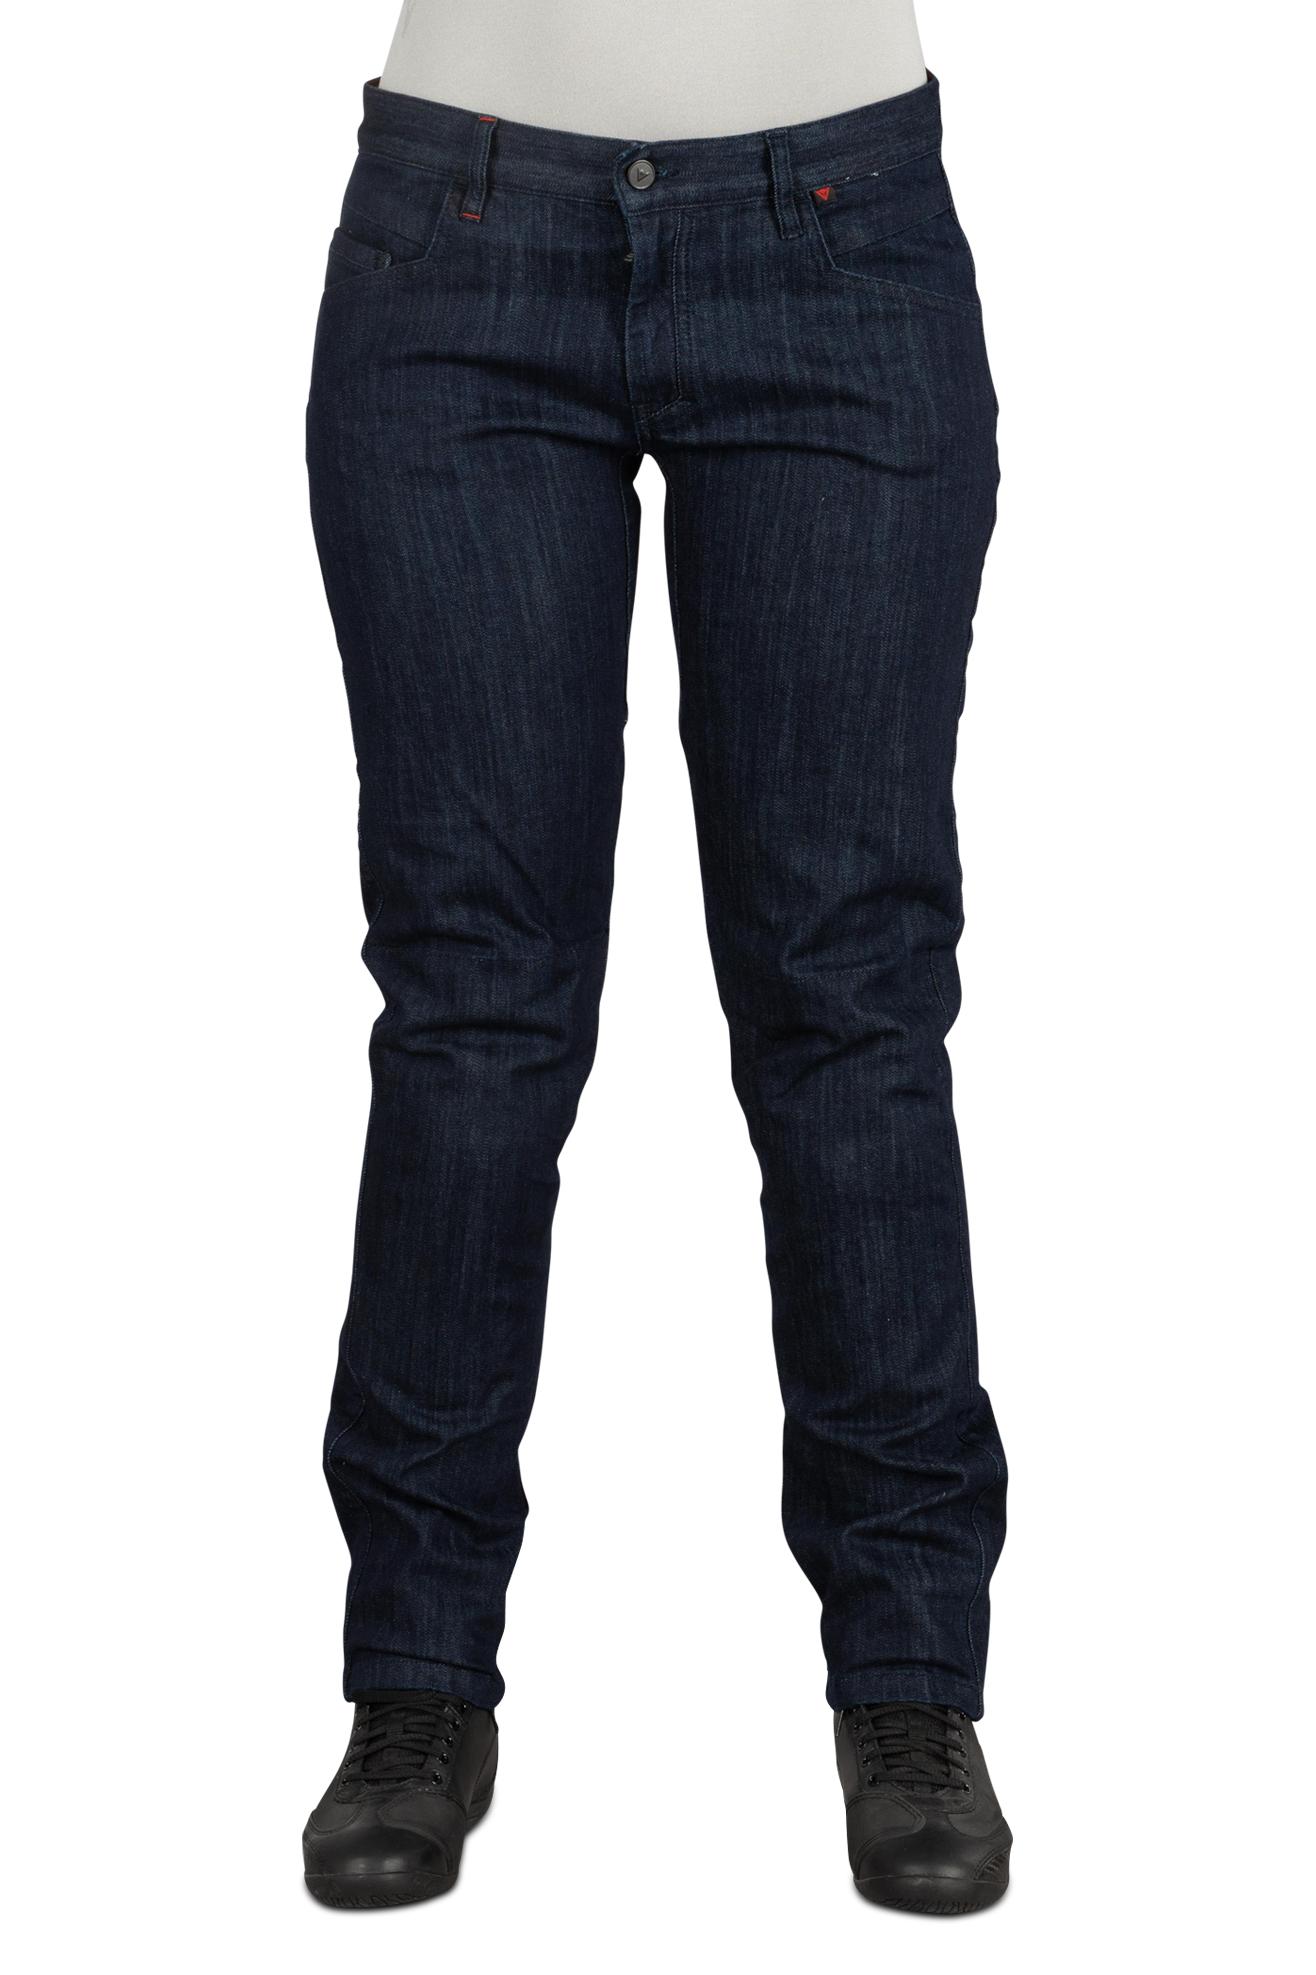 Dainese Jeans Moto Donna  Alba Slim Fit Blu Scuro